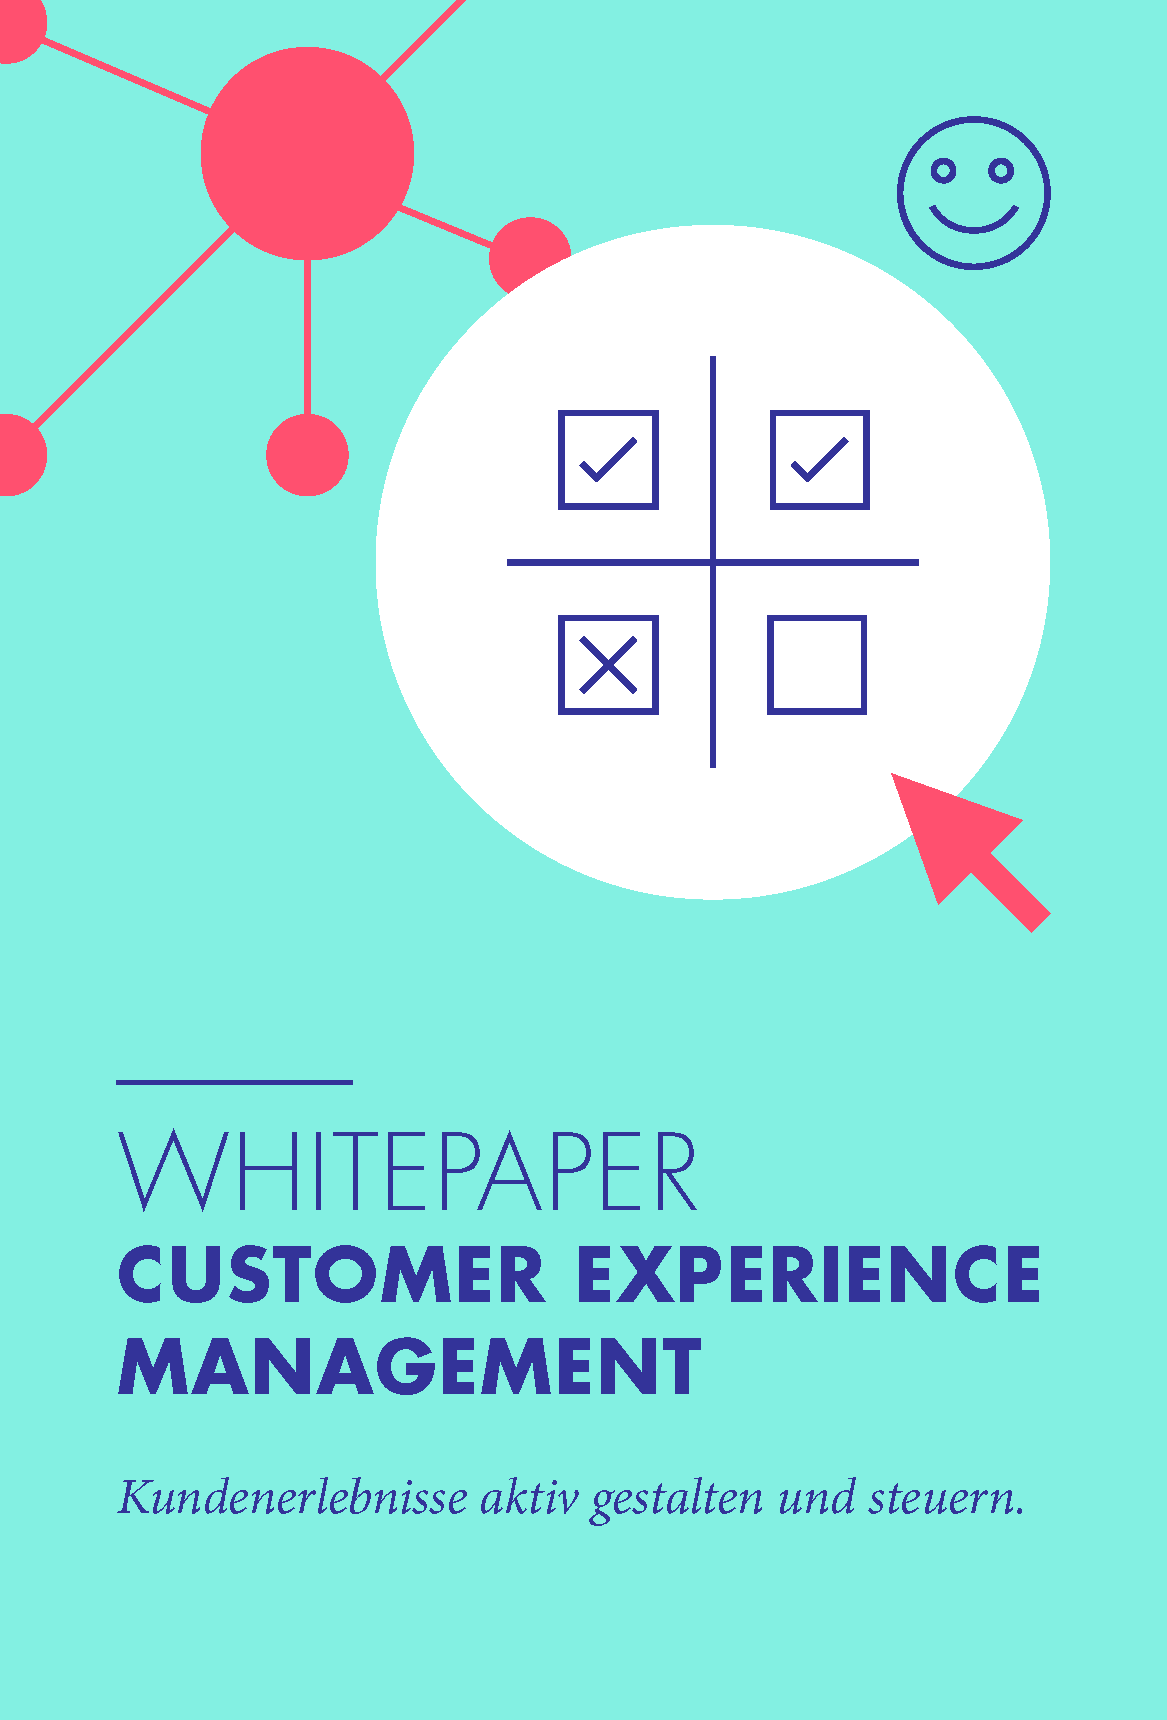 Whitepaper Customer Experience Management